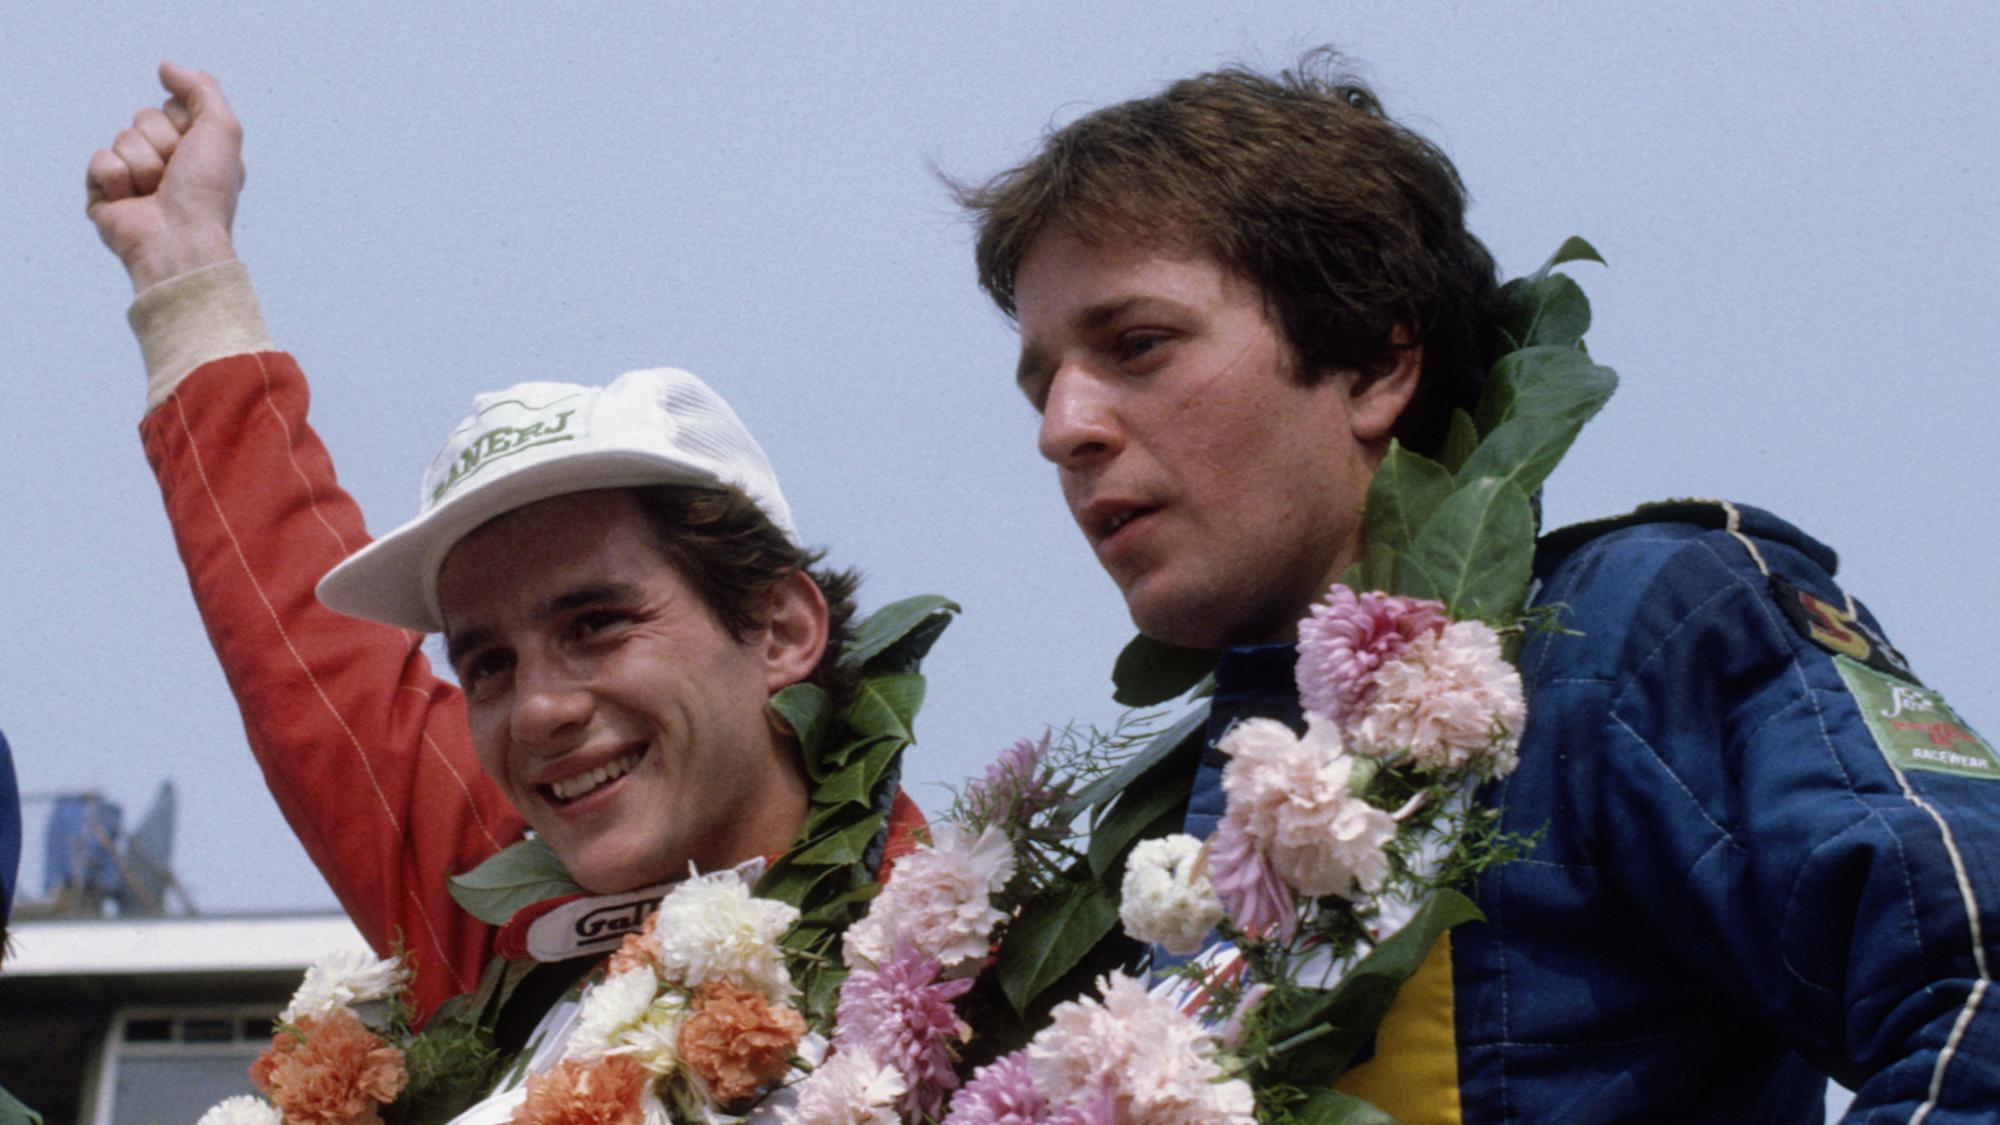 Ayrton Senna celebrates winning the 1983 British F3 championship at Silverstone next to Martin Brundle